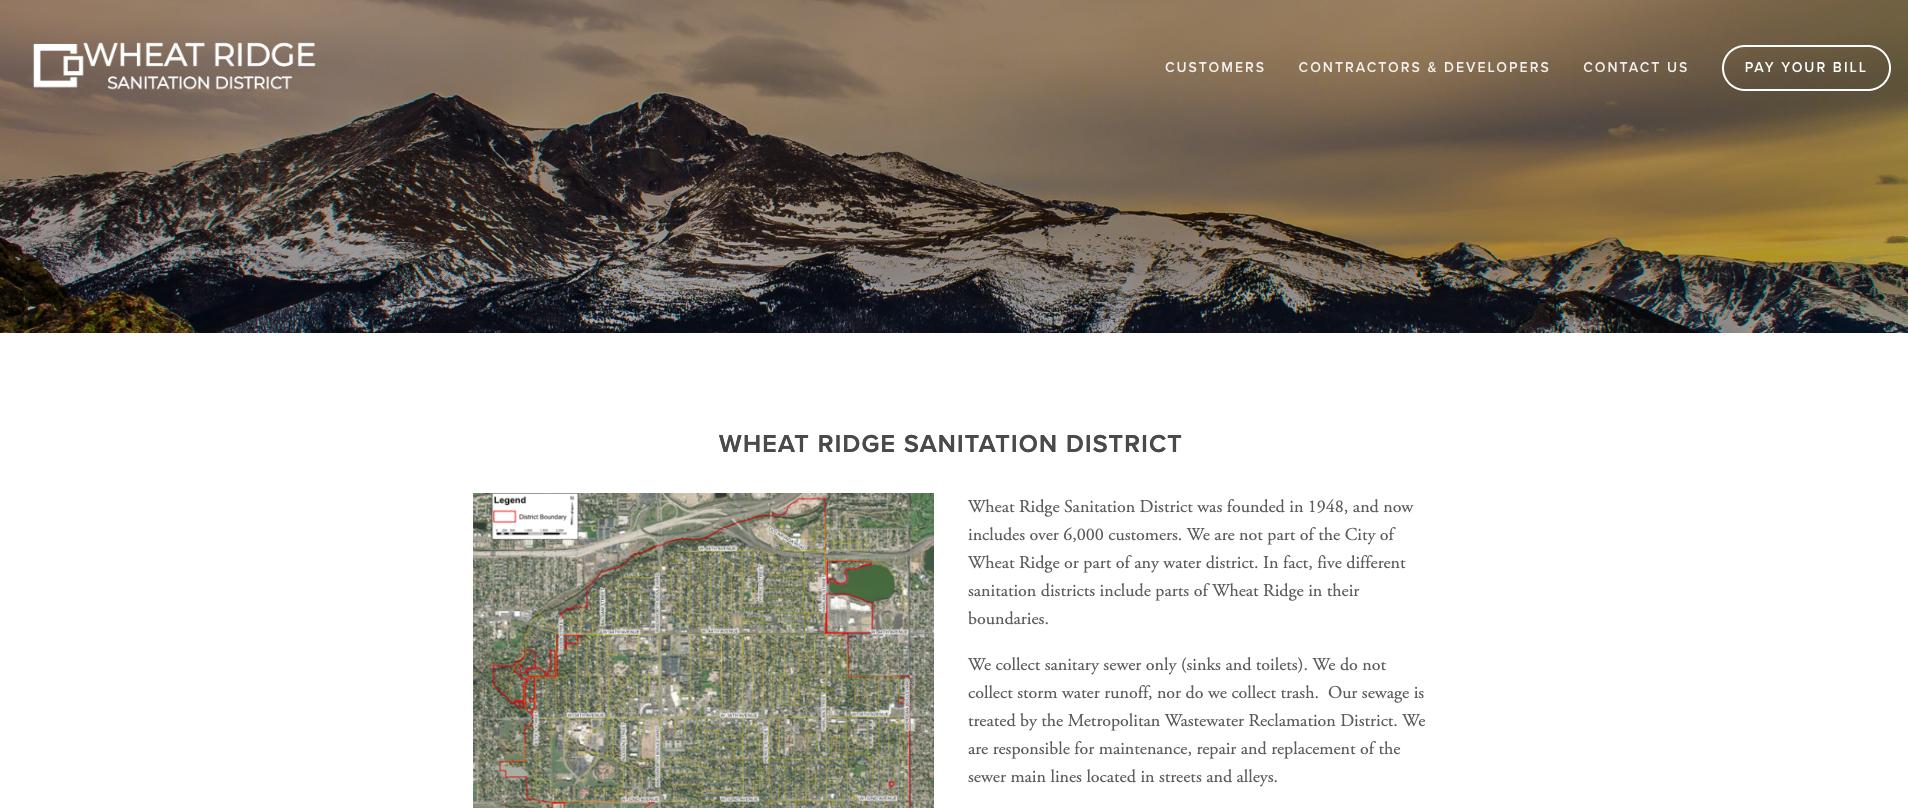 Wheat Ridge Sanitation website redesign using Squarespace.